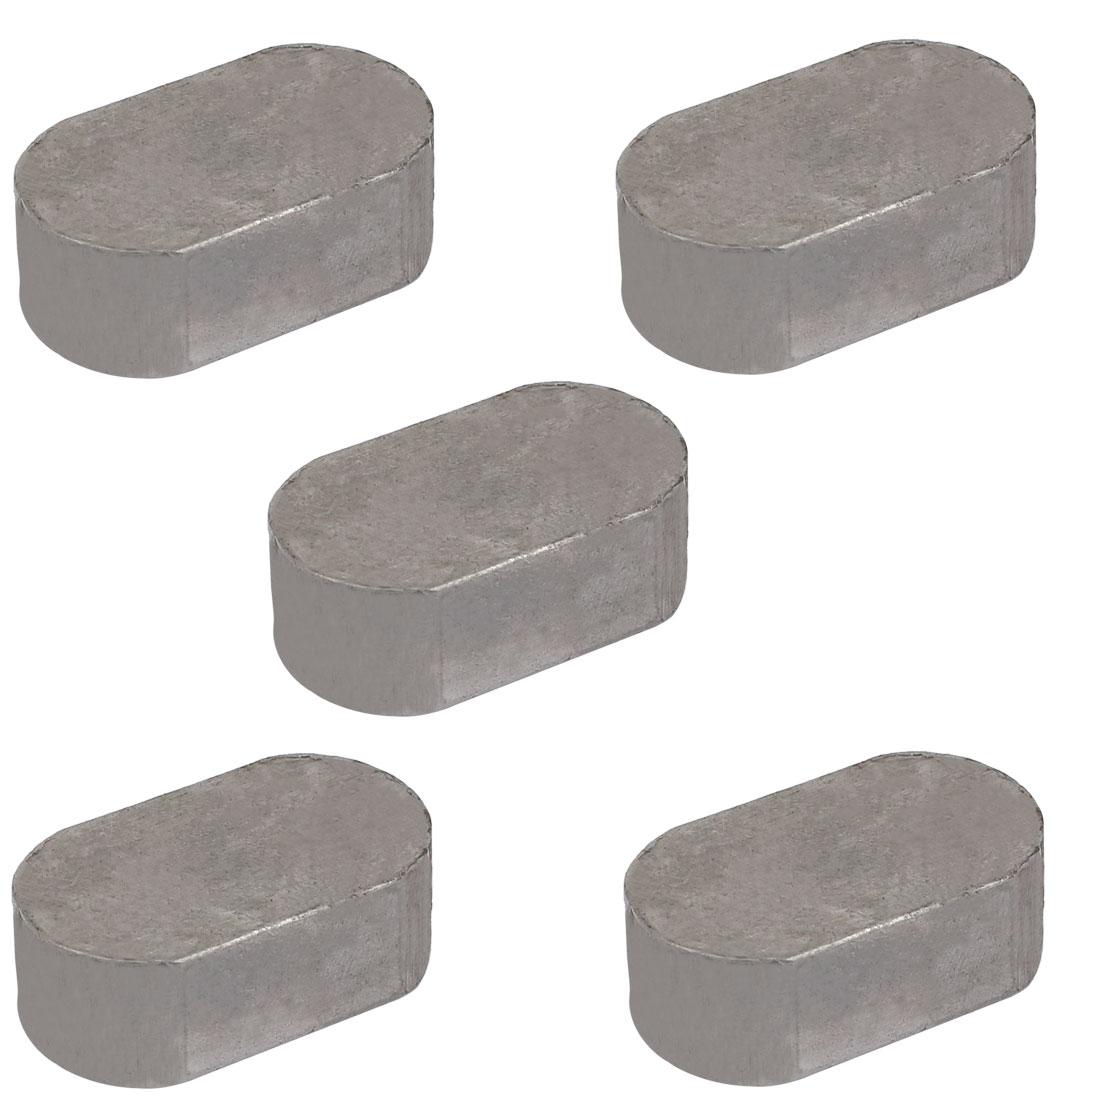 32mmx18mmx11mm Carbon Steel Key Stock To Lock Pulleys 5pcs